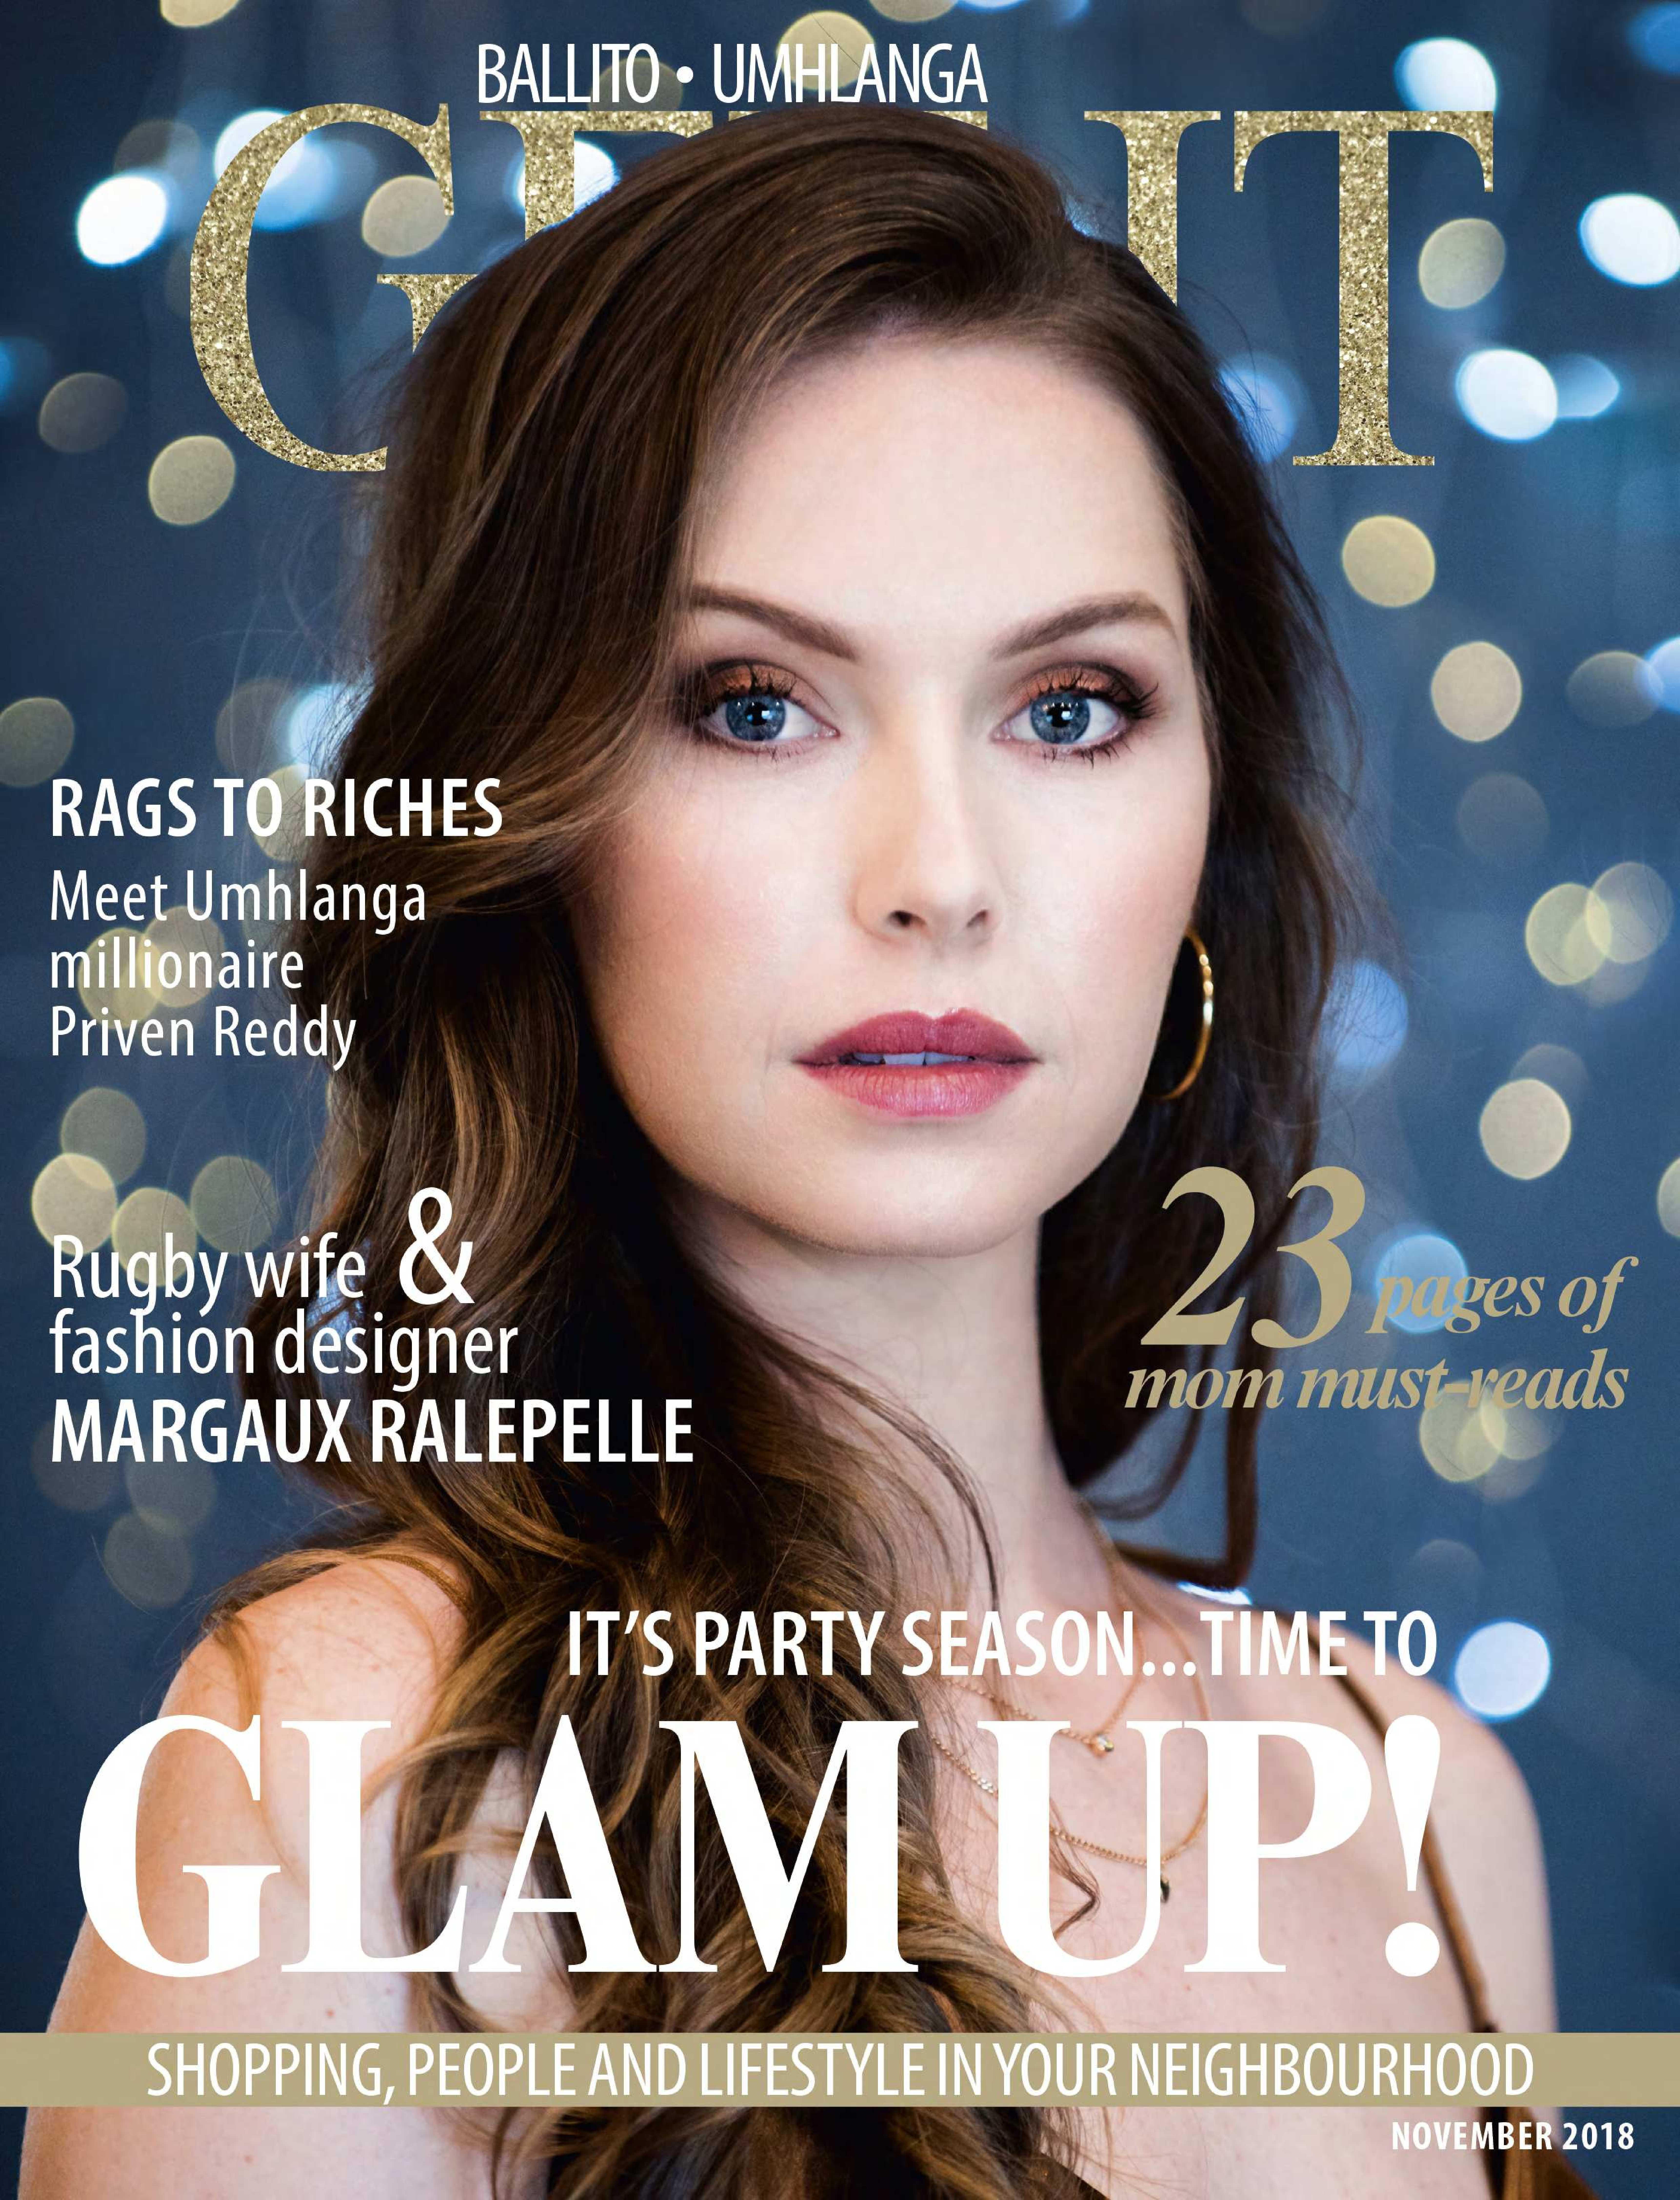 get-magazine-ballitoumhlanga-november-2018-epapers-page-1